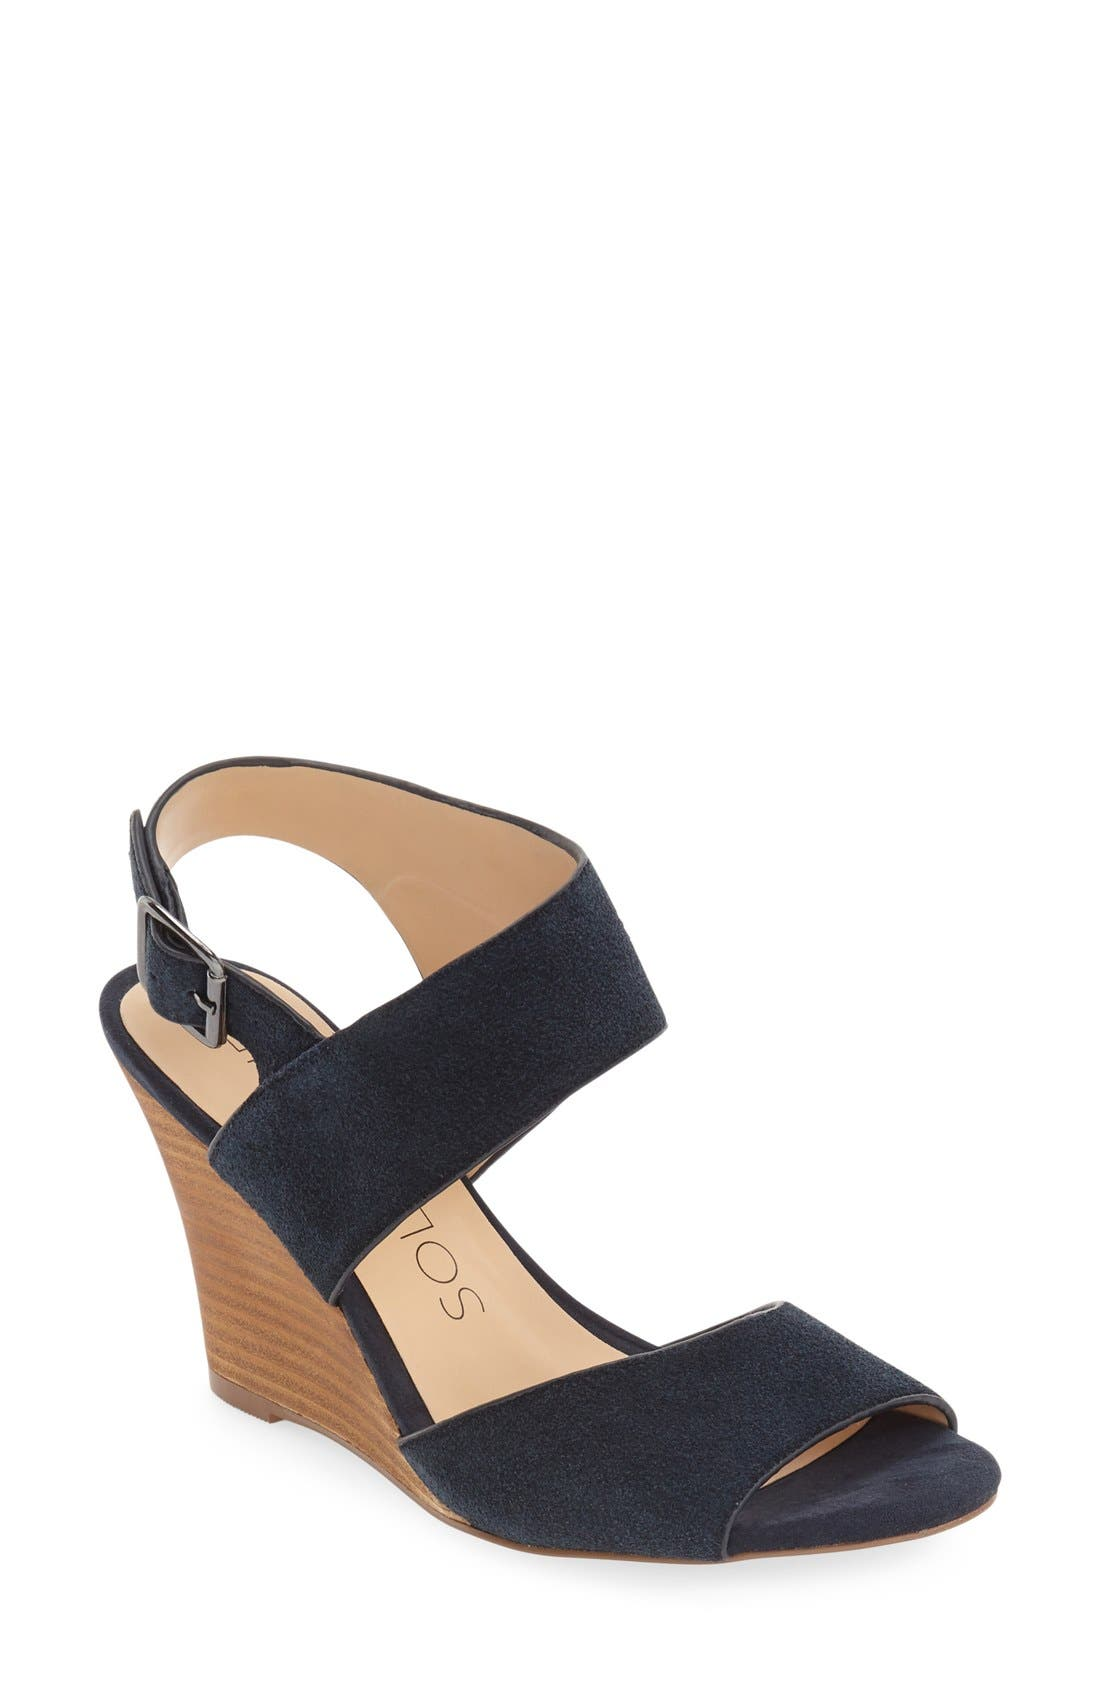 Alternate Image 1 Selected - Sole Society 'Landry' Wedge Sandal (Women)